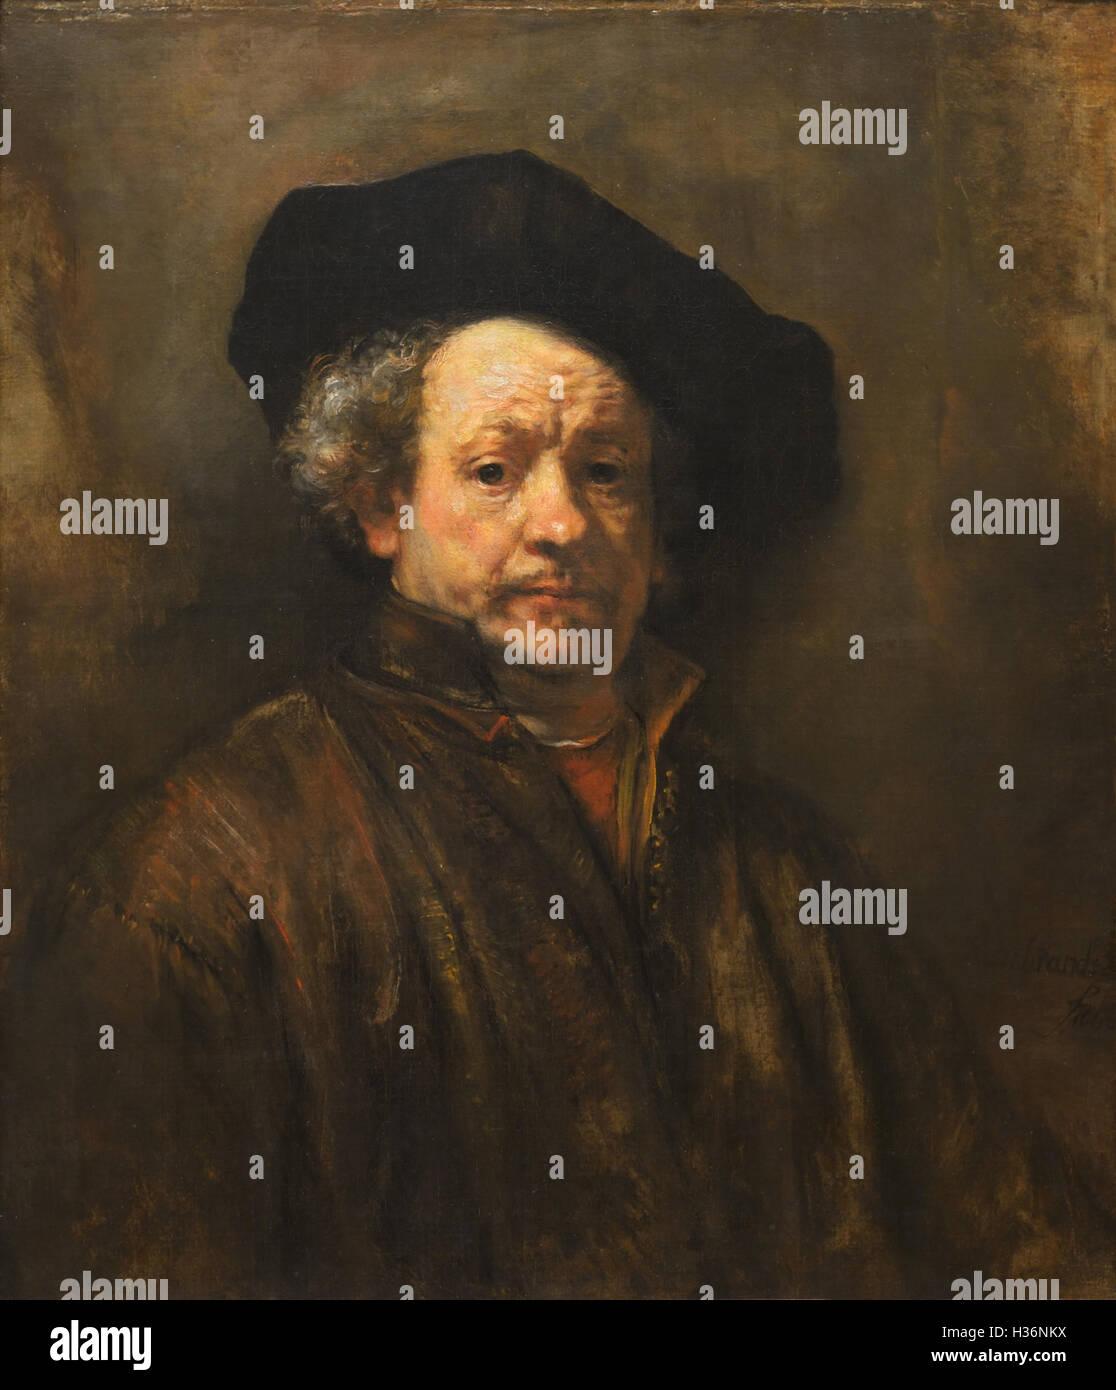 Rembrandt self-portrait, 1660 - Stock Image